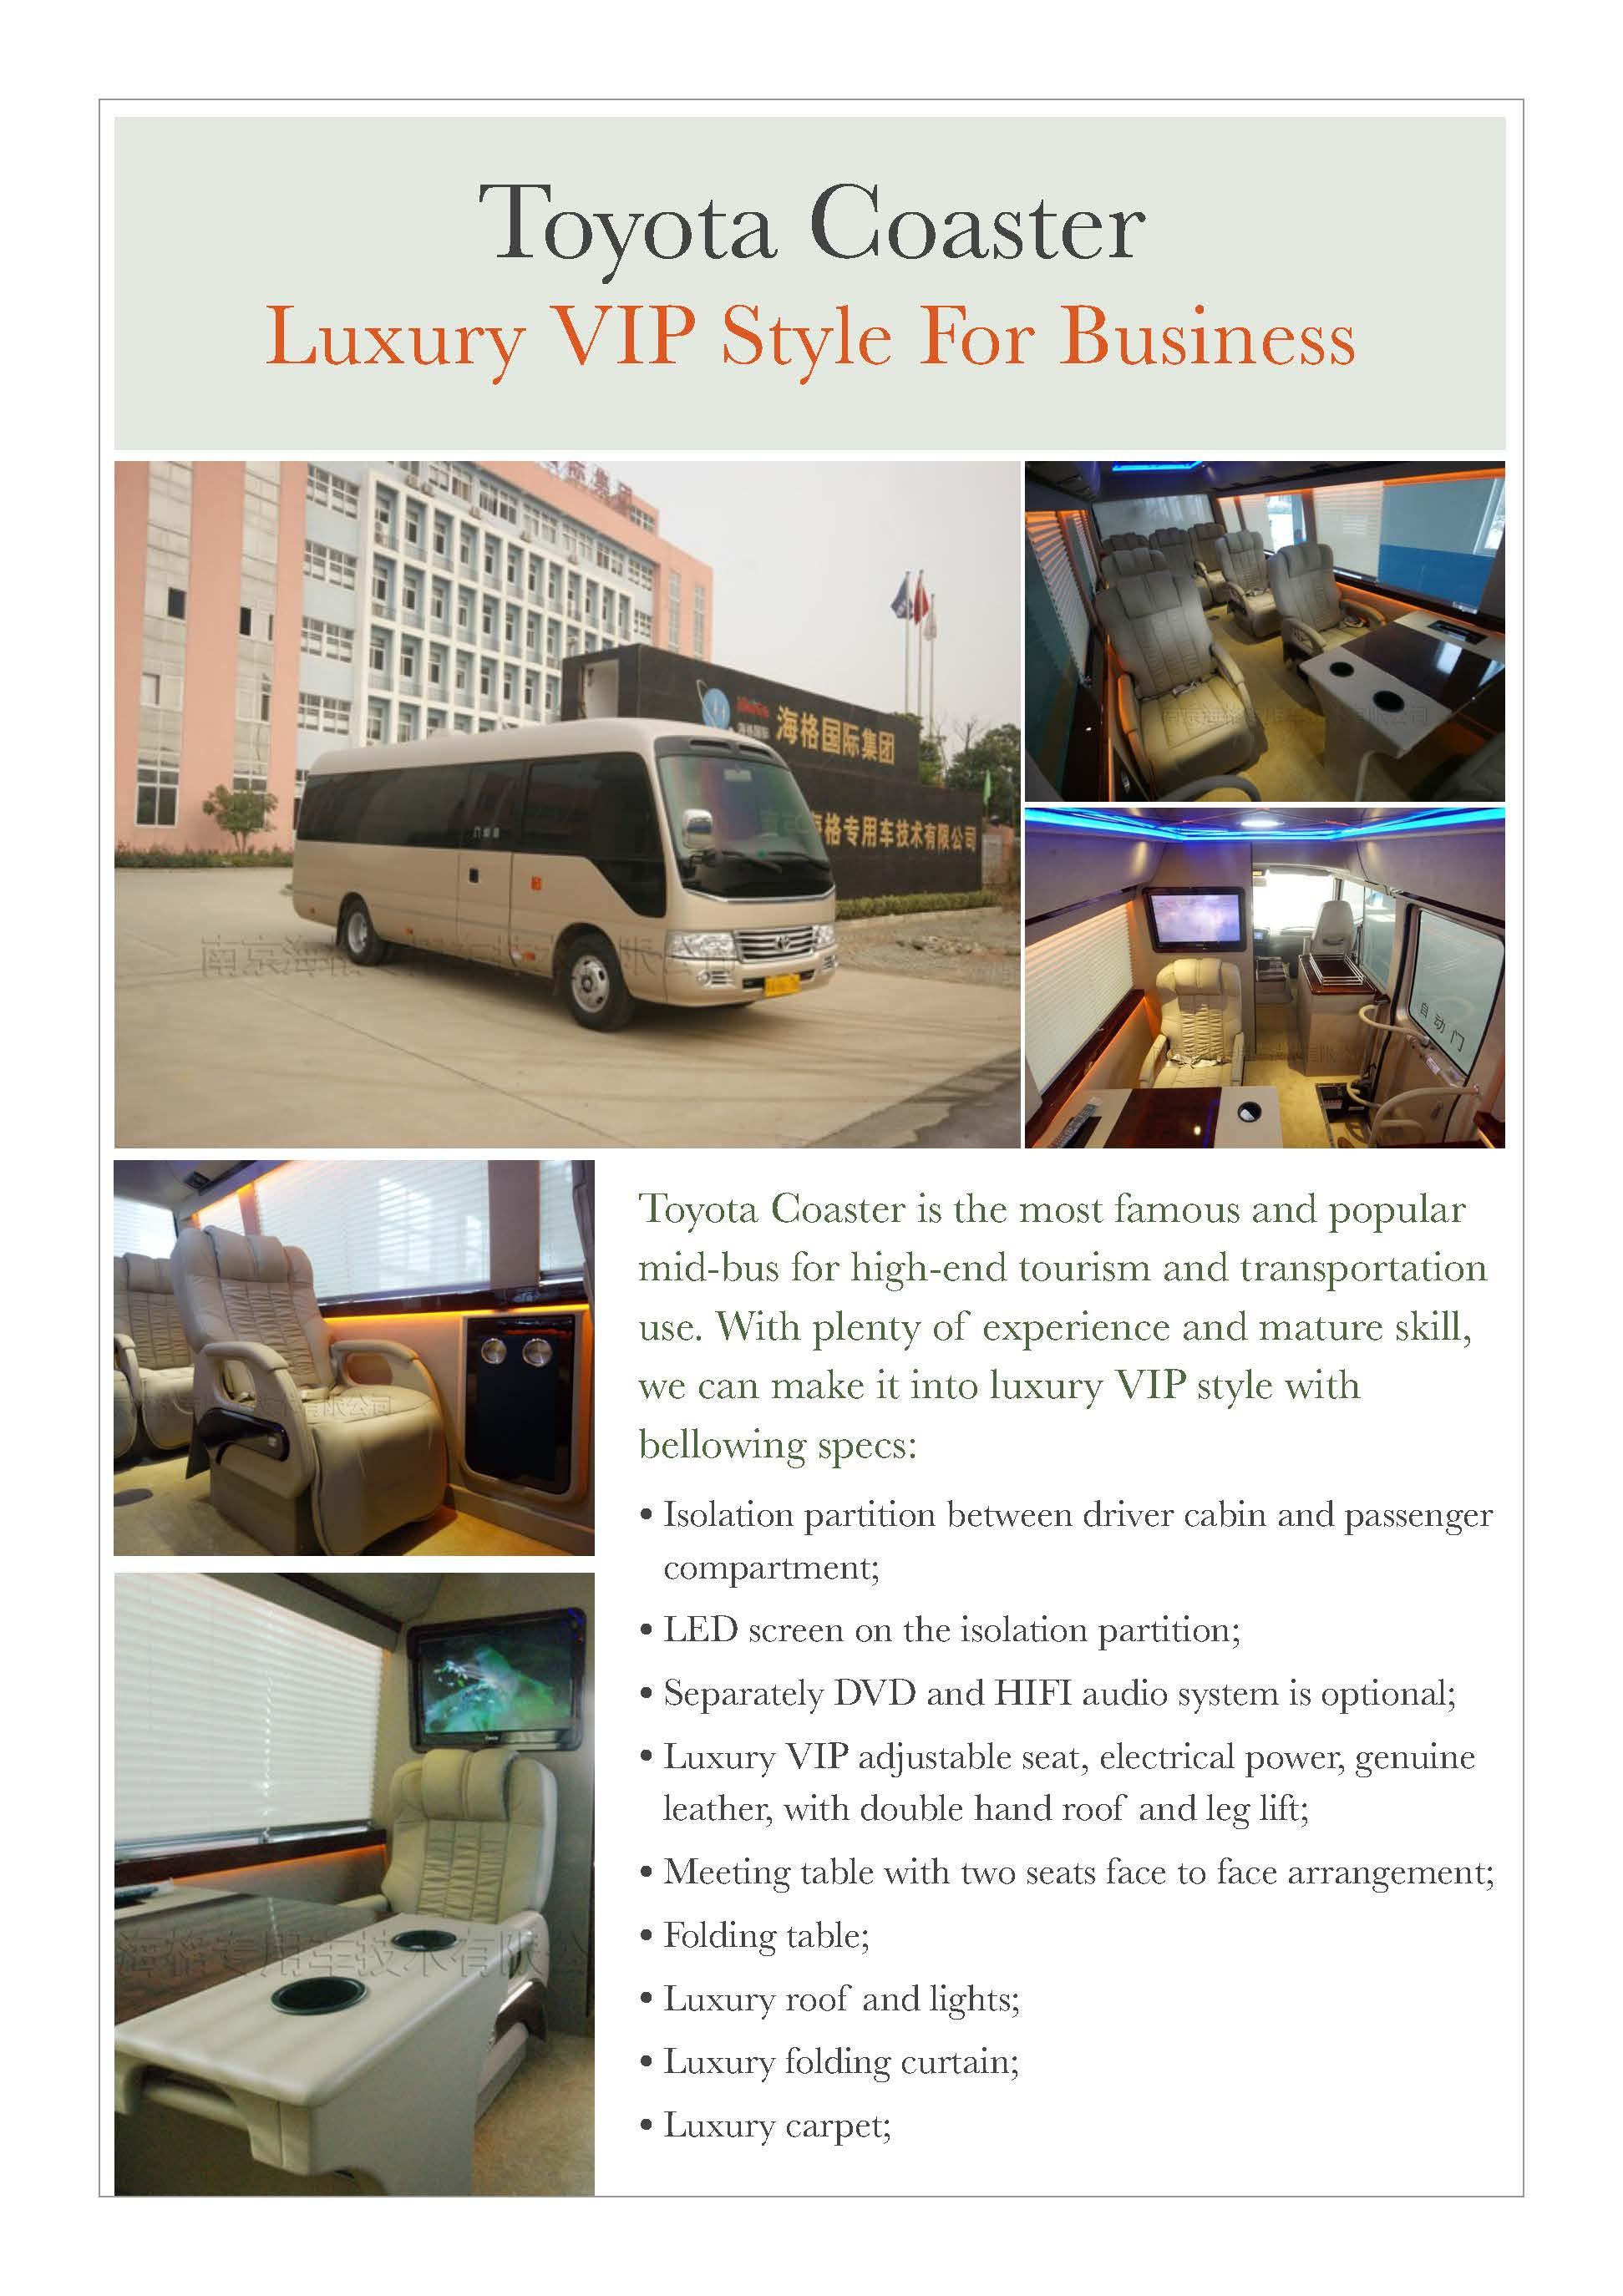 Toyota Coaster VIP 01